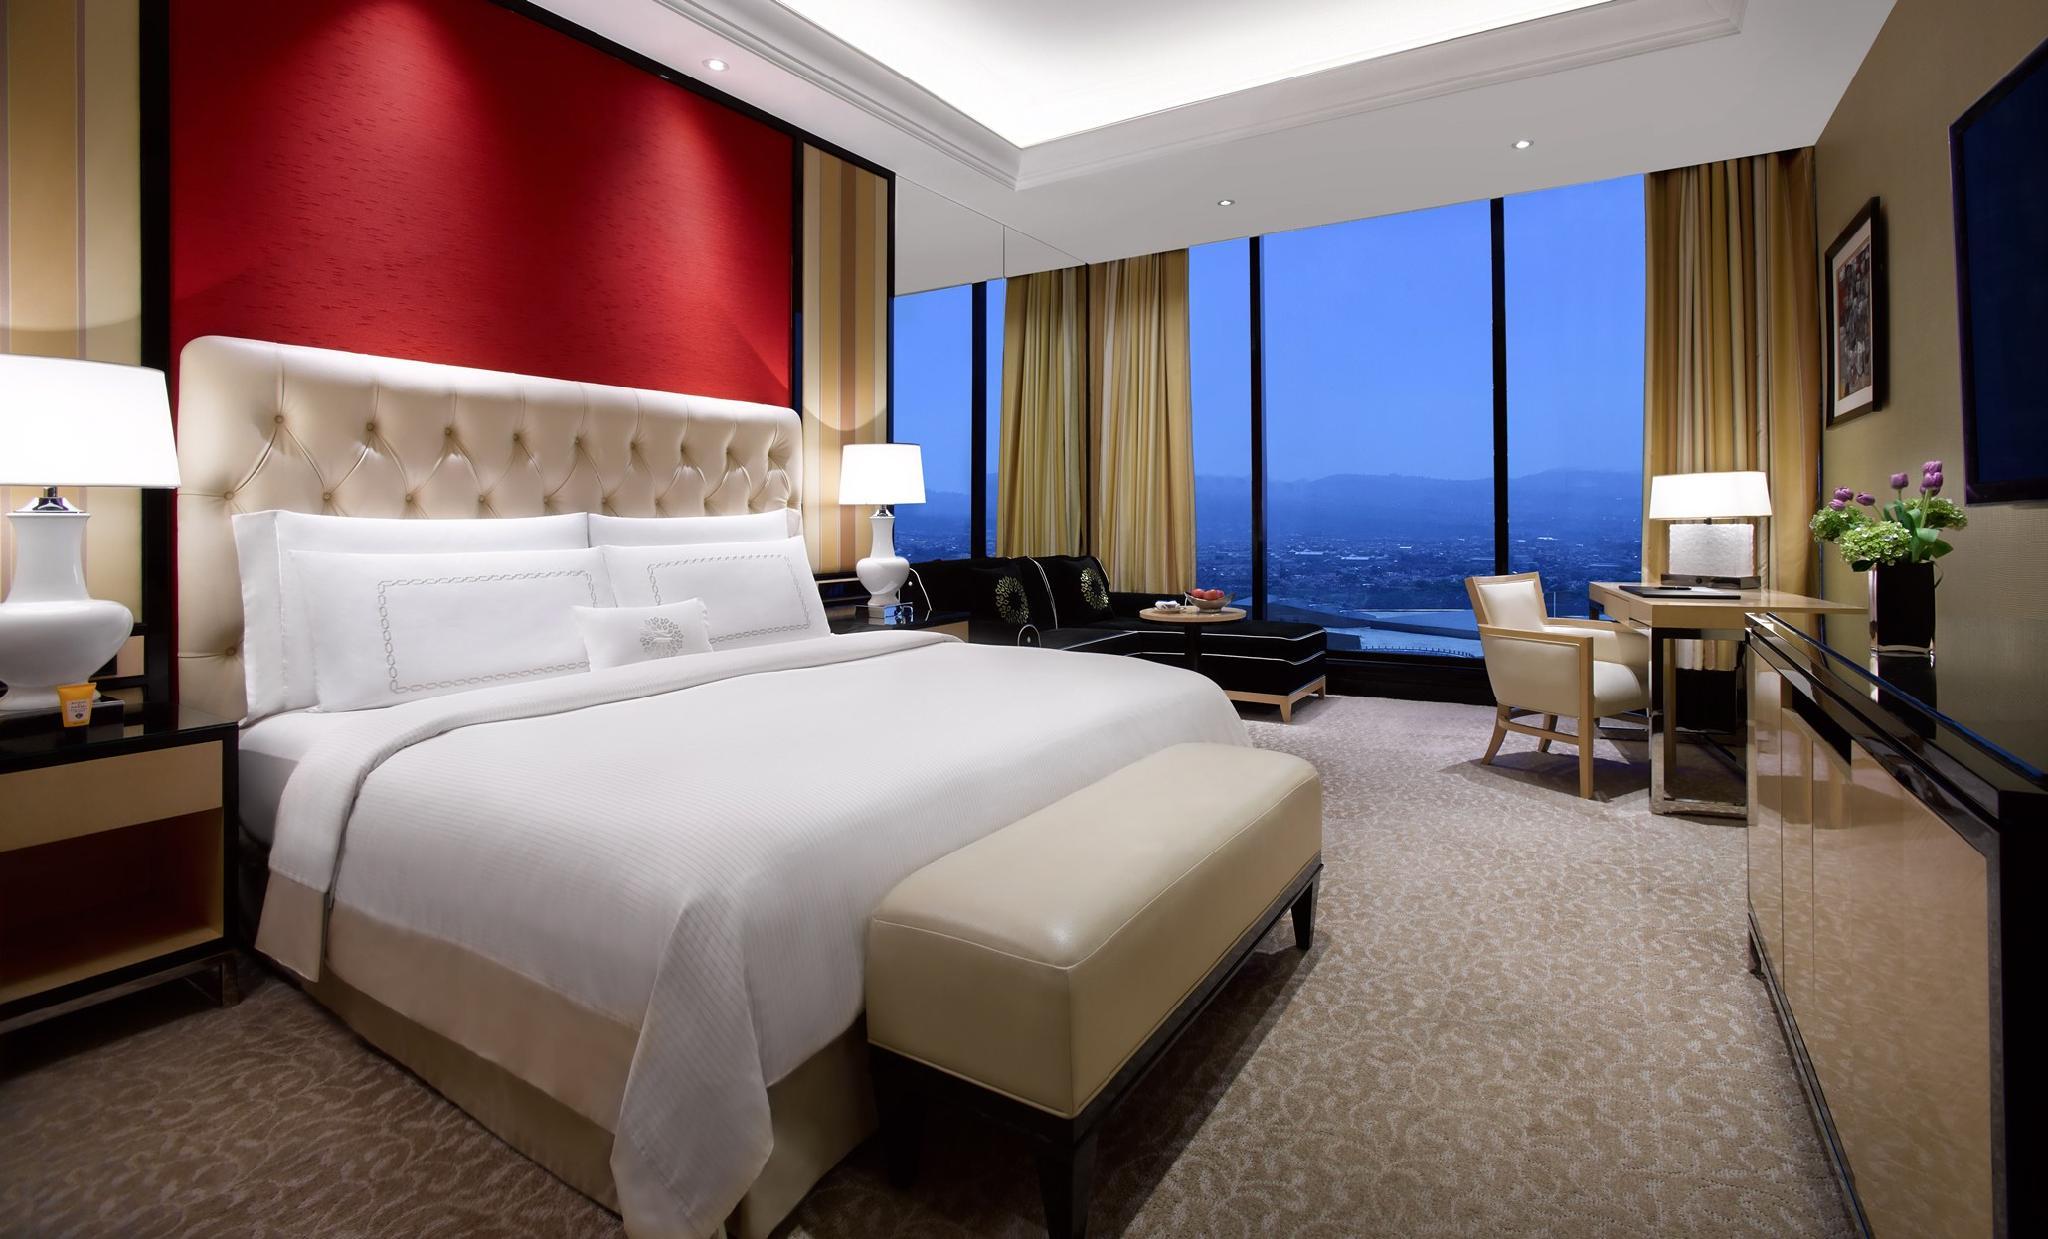 Rekomendasi Hotel Terbaik Trans Luxury Bandung